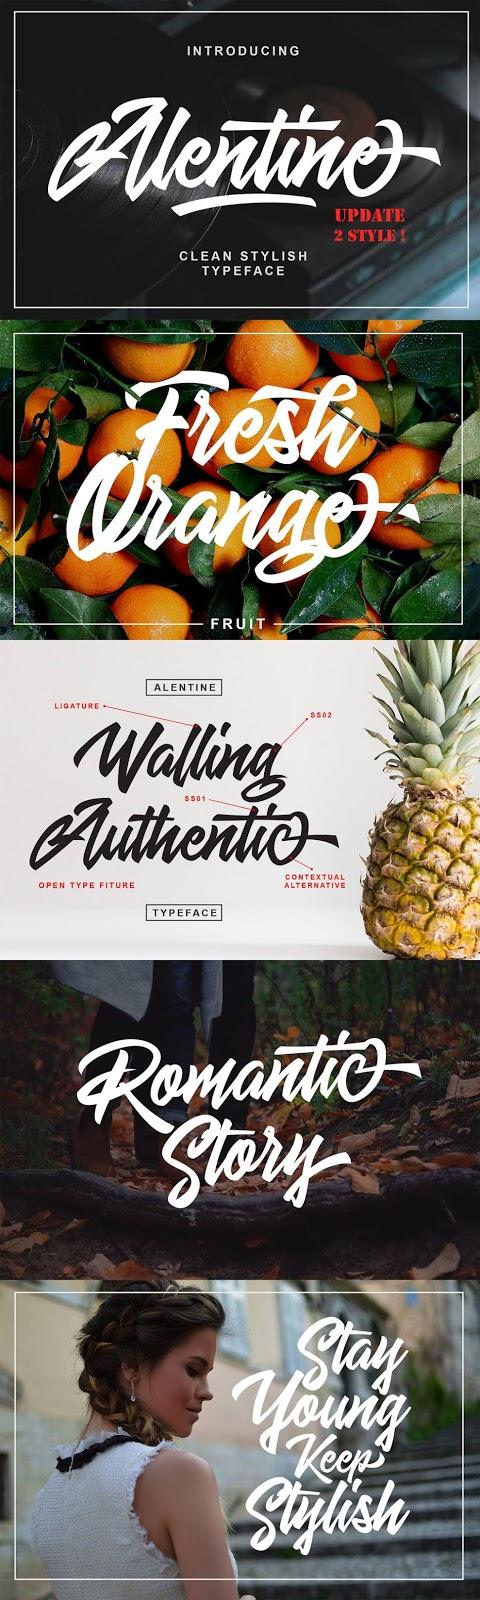 https://creativemarket.com/bangkit.tri.setiadi/1607932-Alentine-Typeface-OFF-40?u=LetteringTime